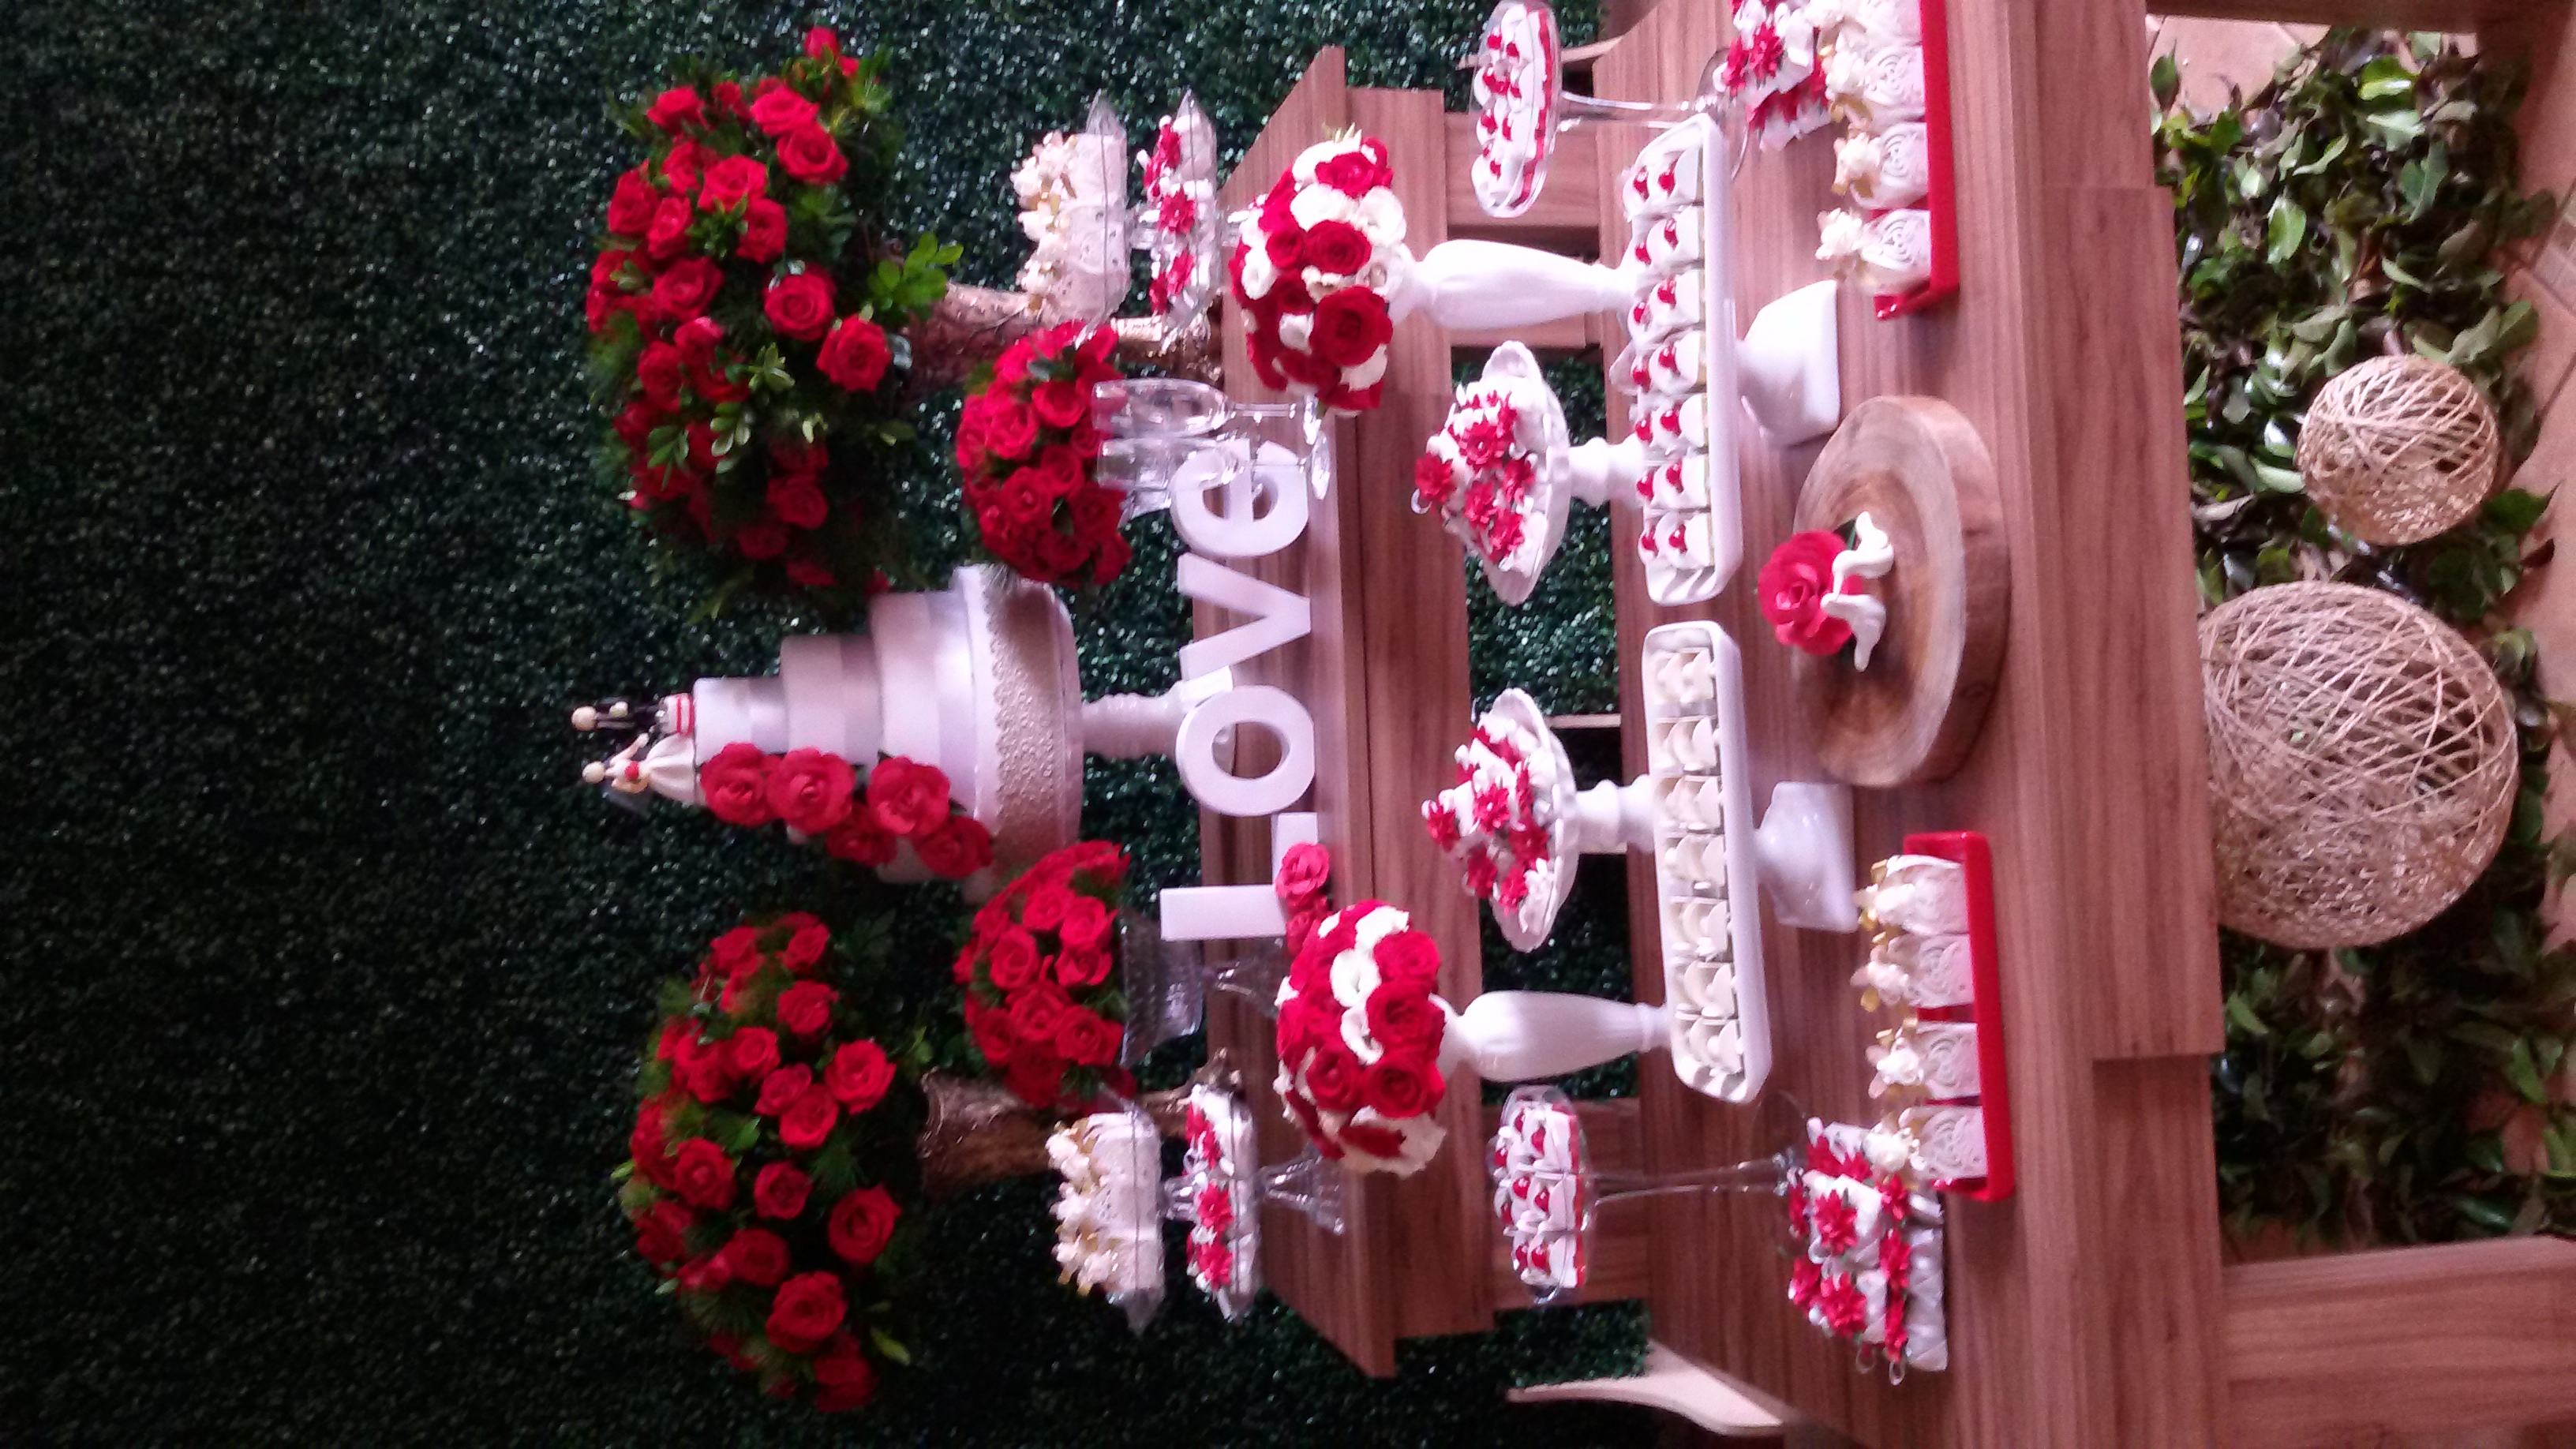 decoracao-casamento-decoracao-casamento-rustico.jpg